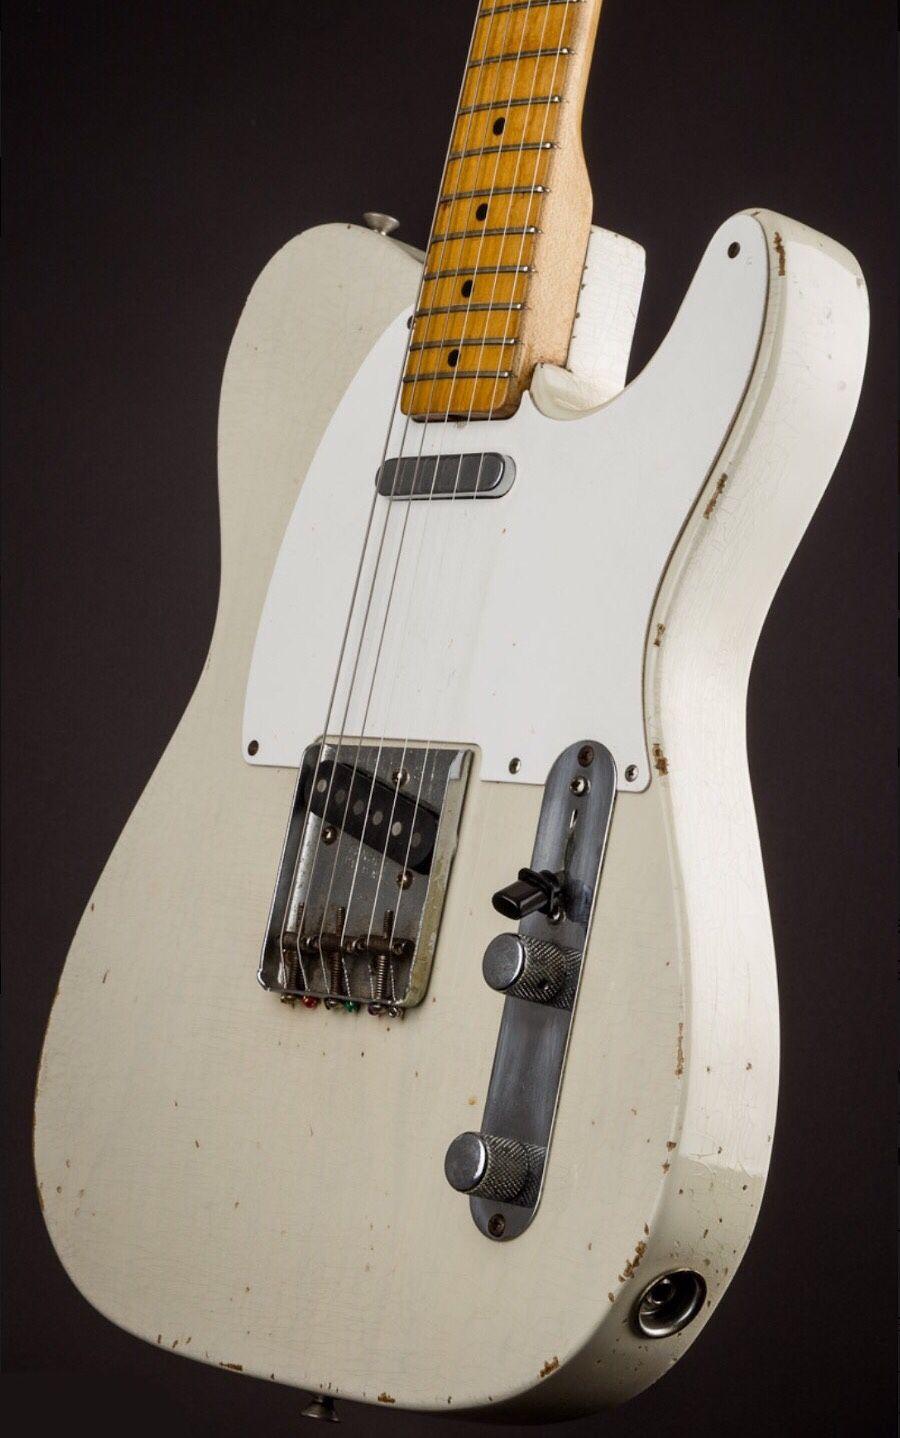 1959) Fender Telecaster with top loader bridge   Telecasters